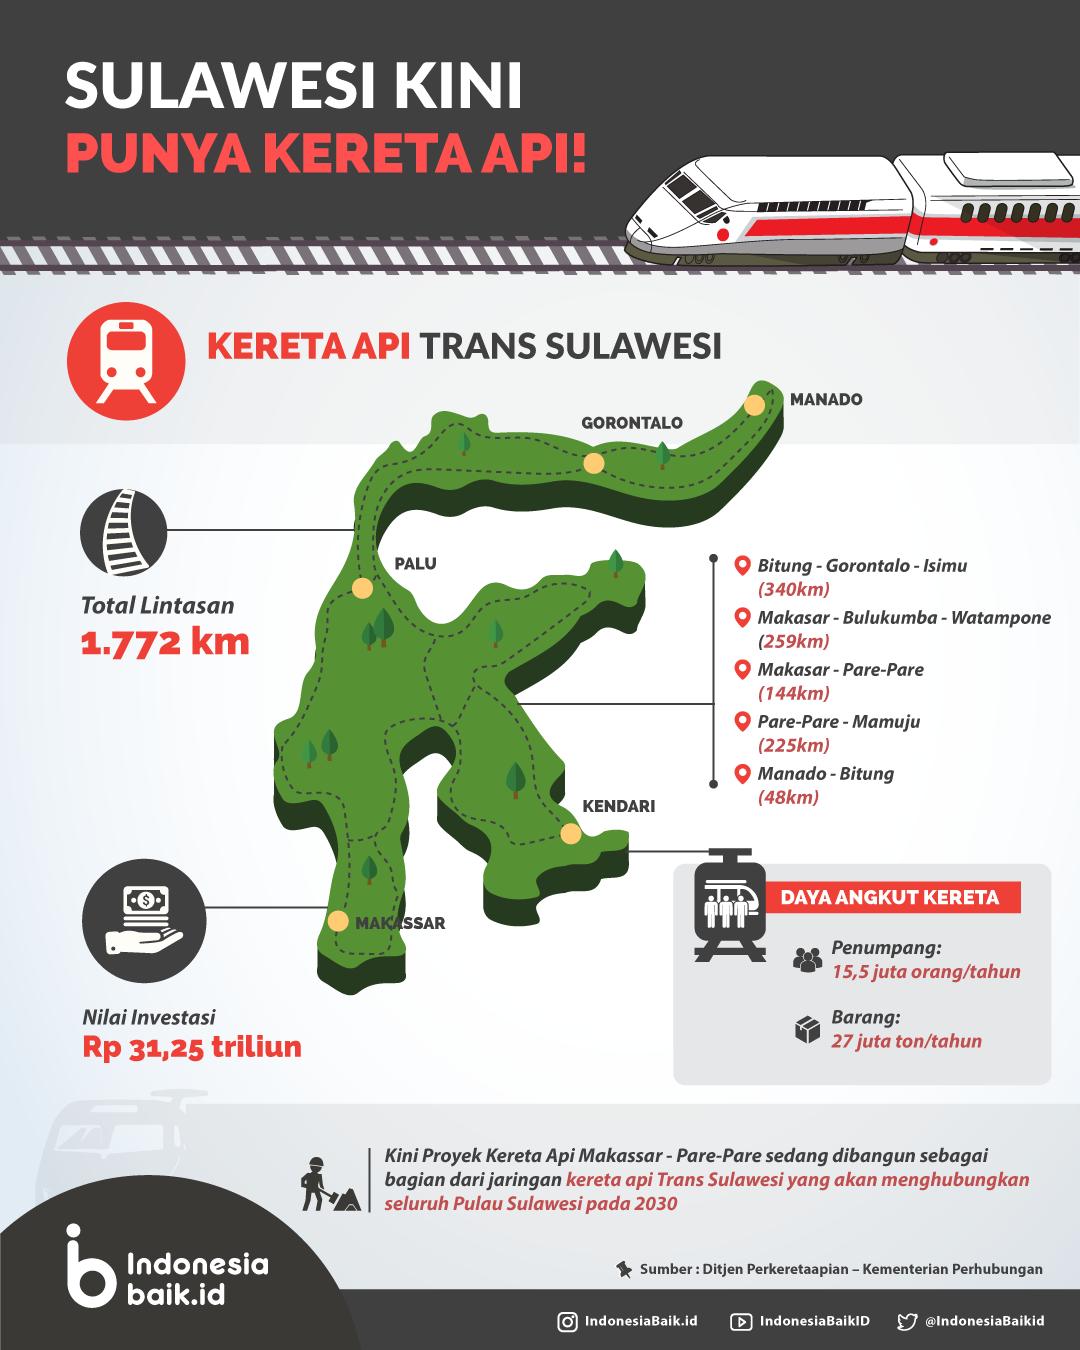 Sulawesi Kini Punya Kereta Api